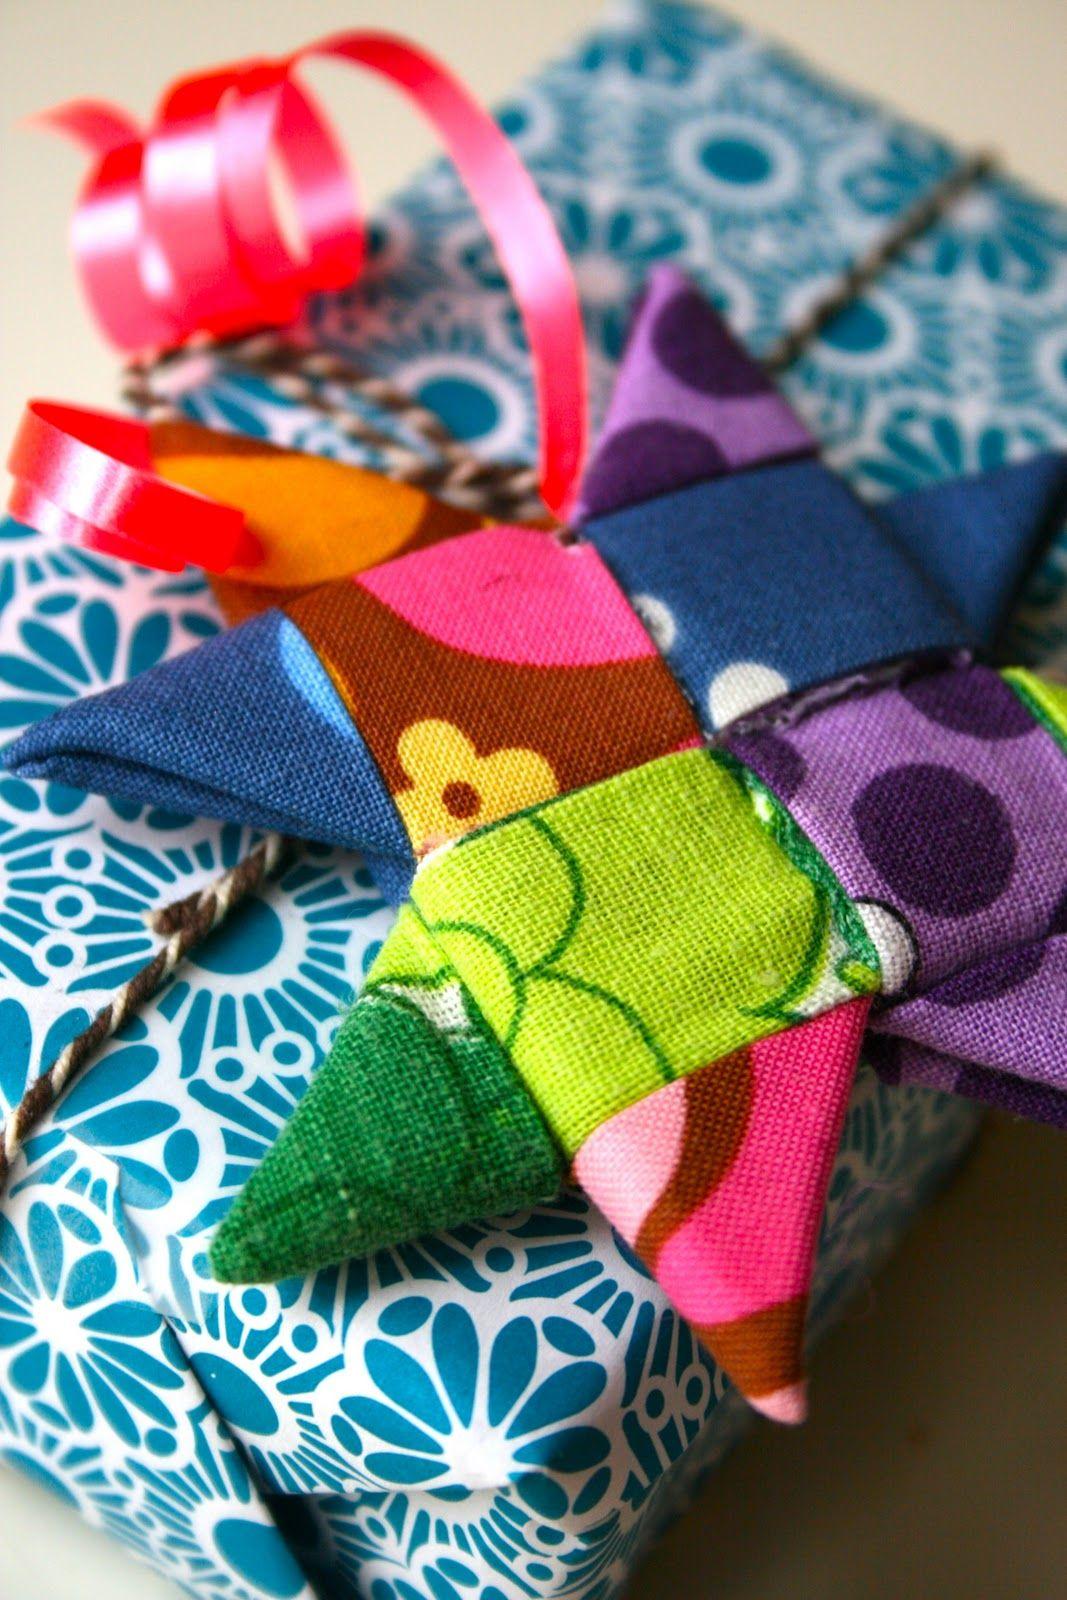 Fabric Star tutorial by Sofie Legarth, in Danish